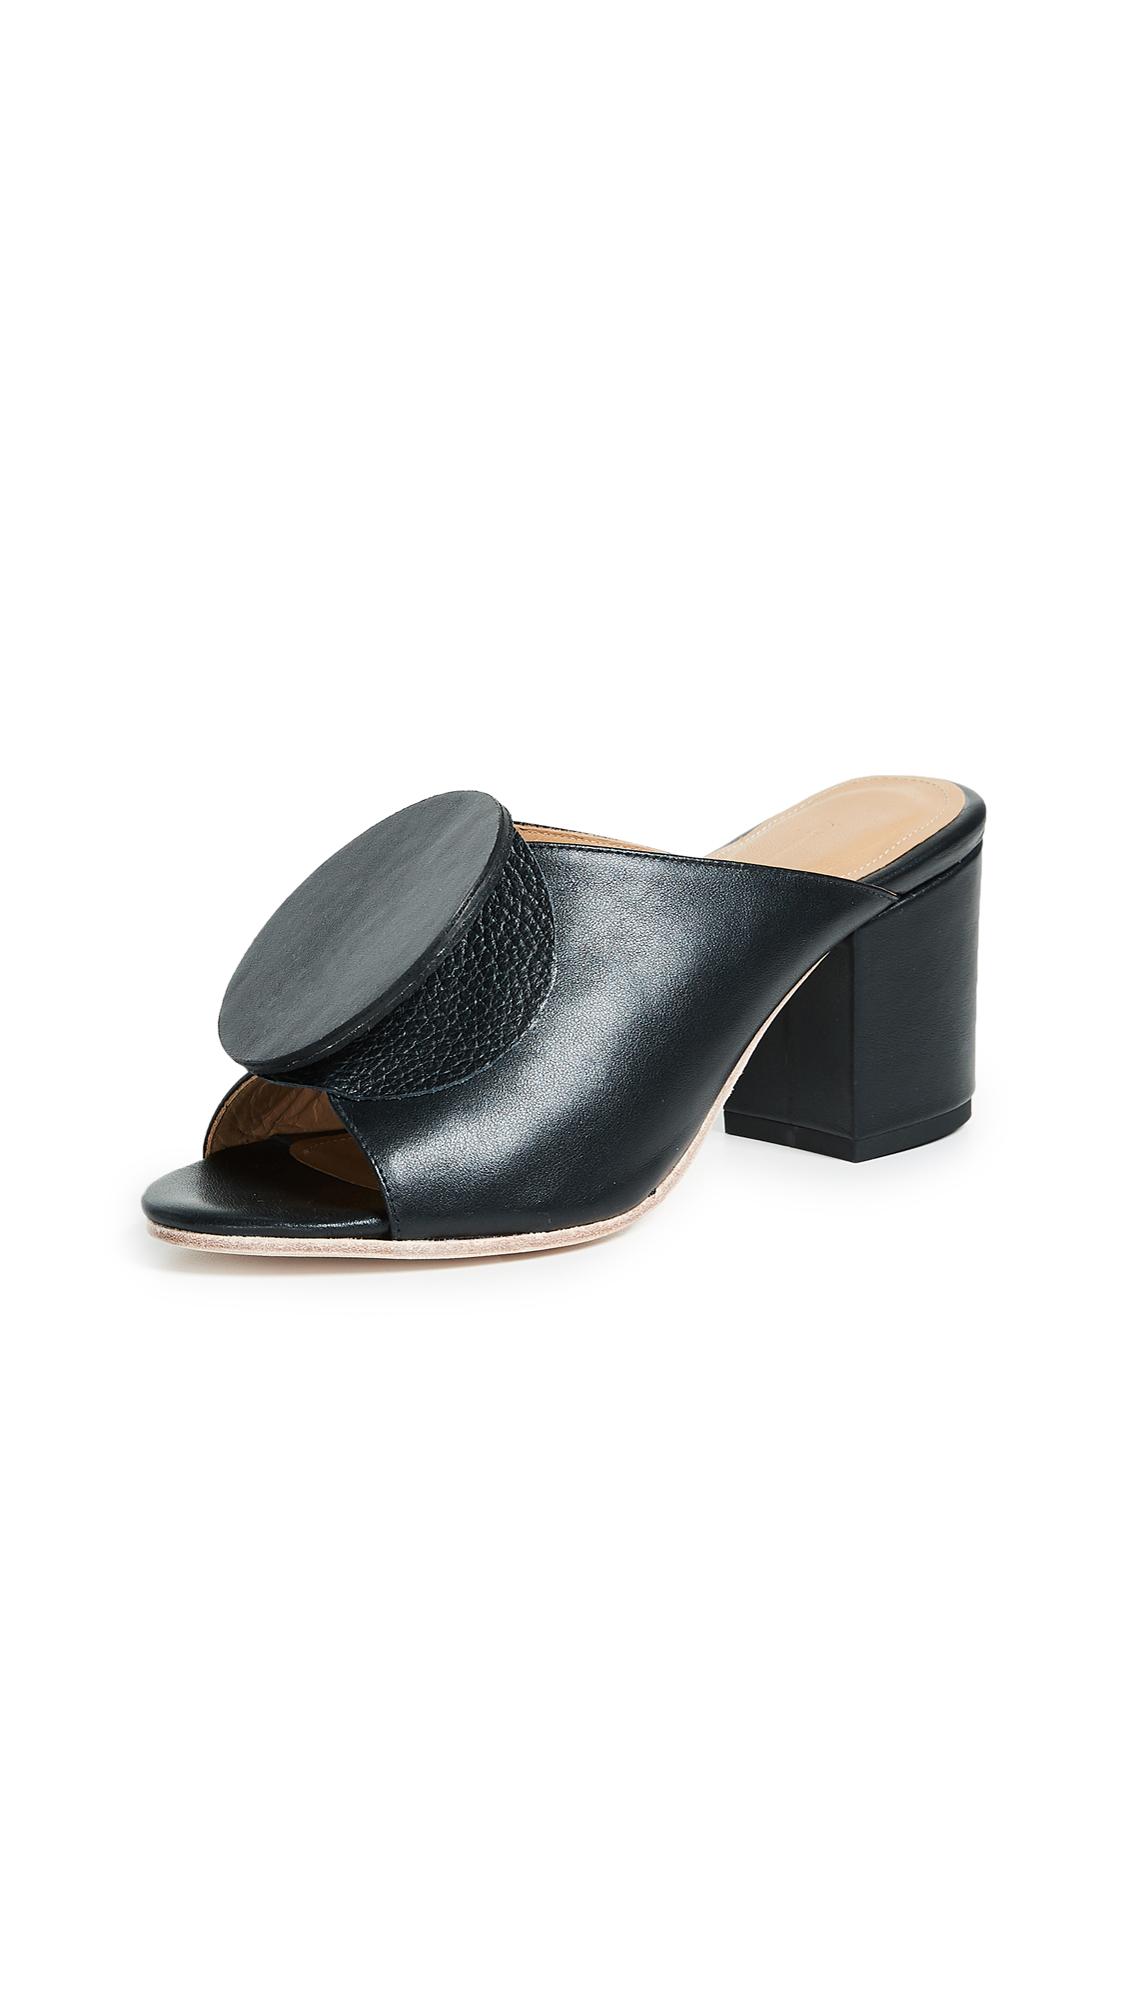 The Palatines Salio Origami Mules - Black/Black